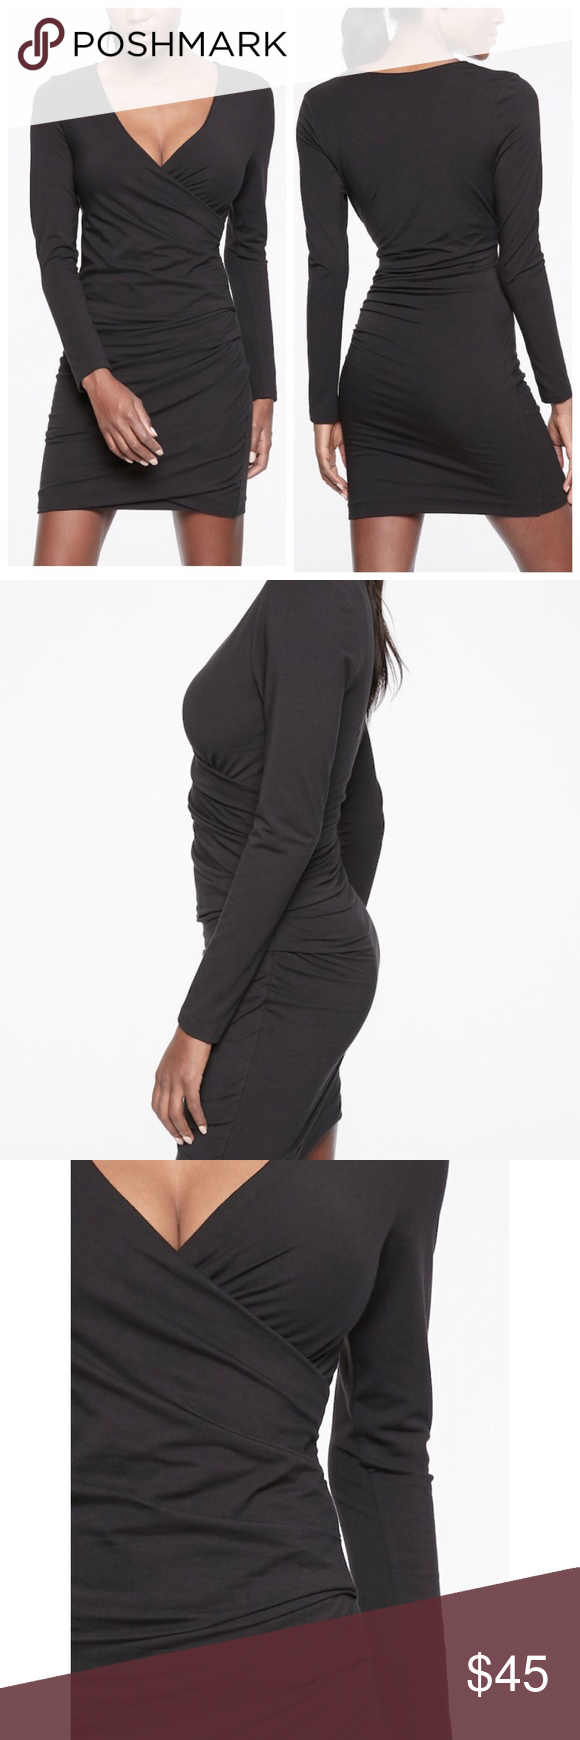 Nwt Athleta Wilder Ruched Black Dress Xl Tall Black Ruched Dress Black Long Sleeve Dress Dresses [ 1740 x 580 Pixel ]